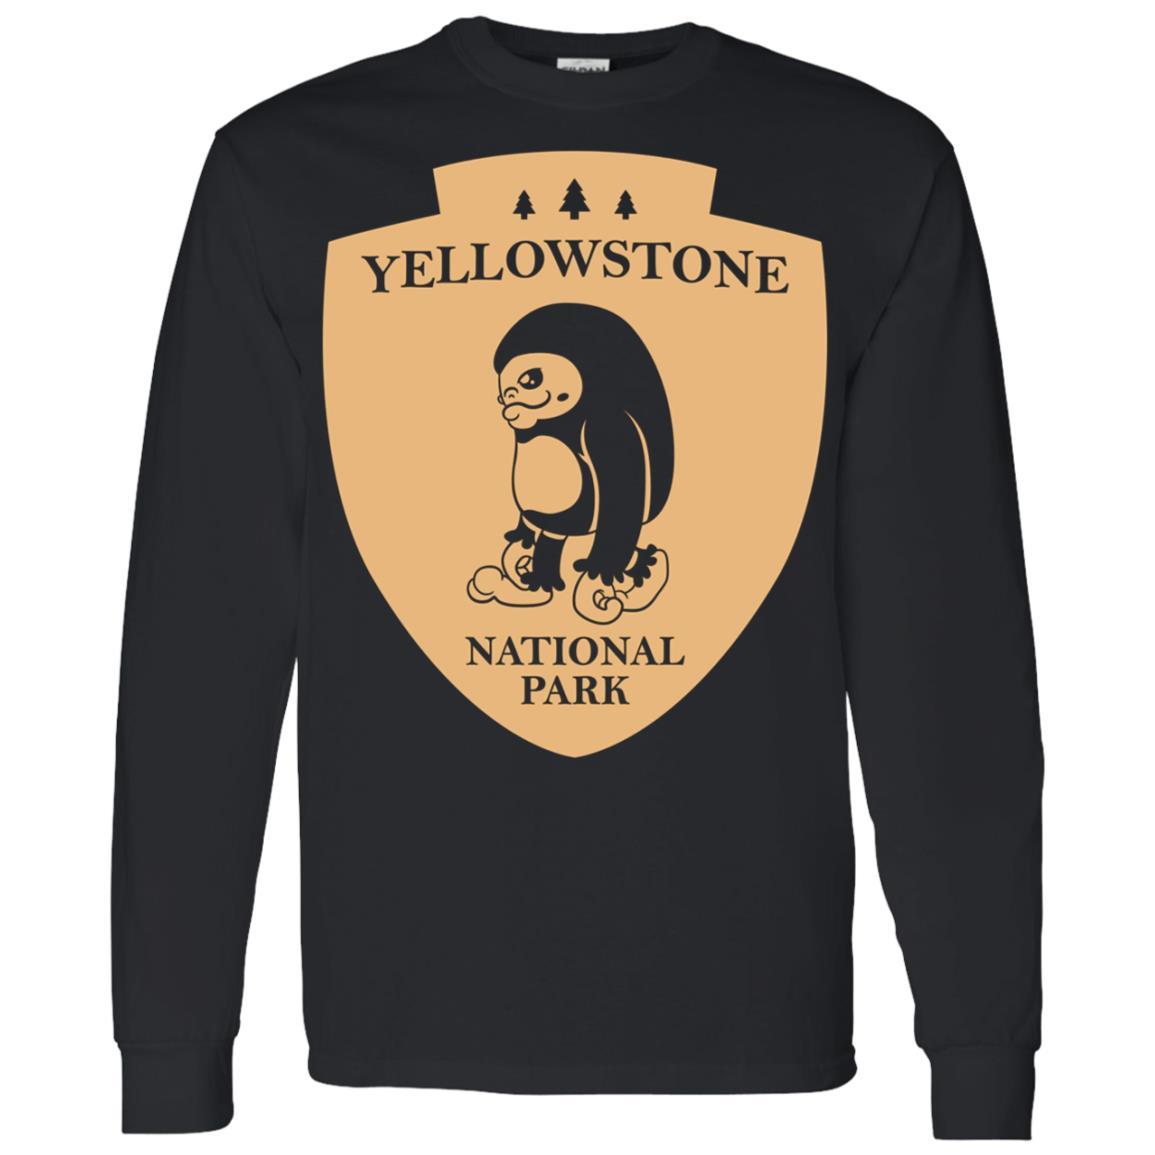 Yellowstone National Park Men Long Sleeve T-Shirt